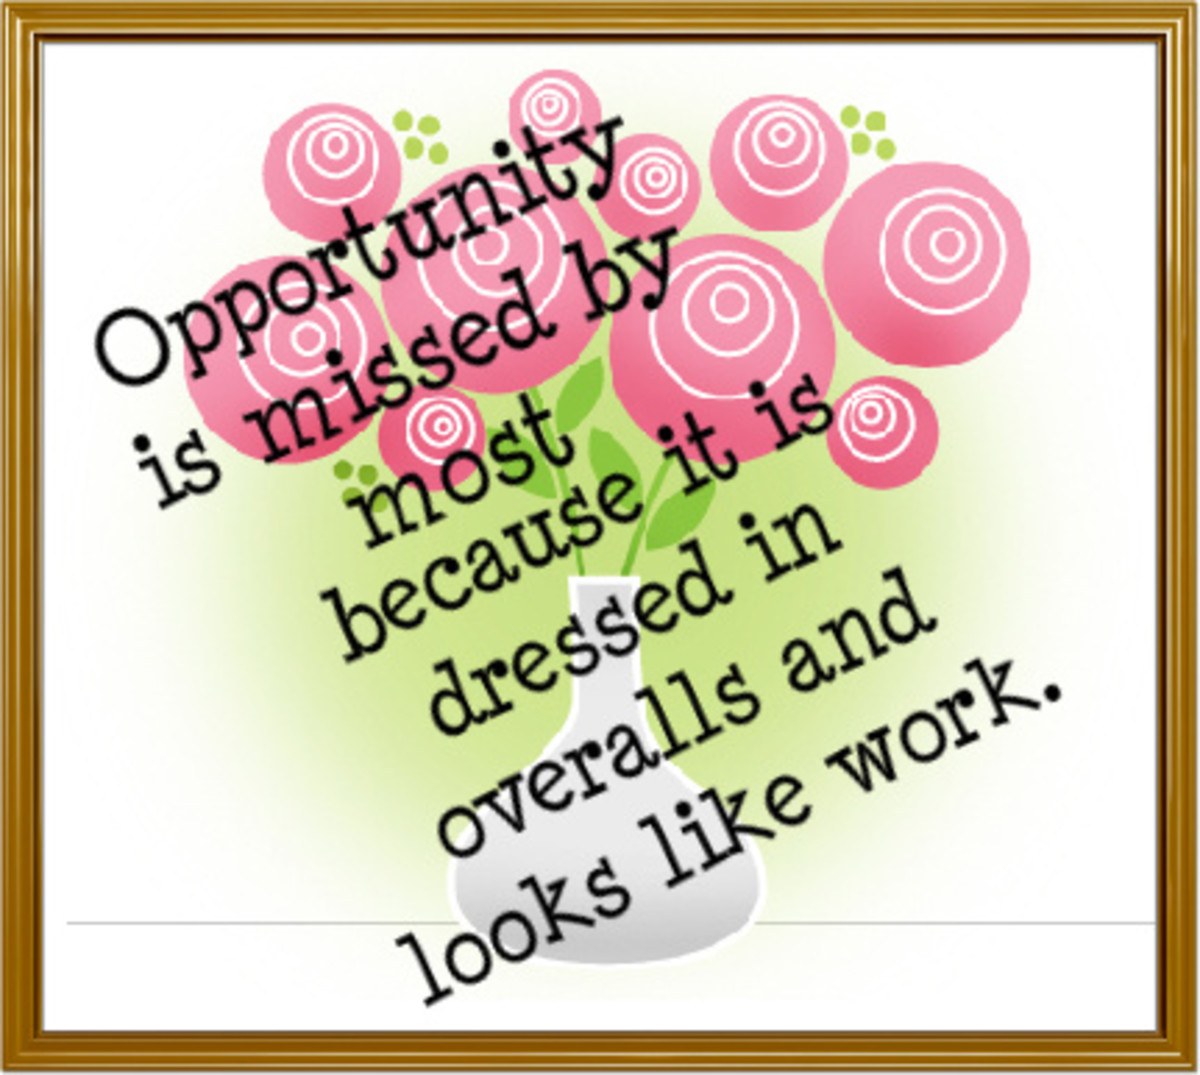 Thomas Alva Edison on Opportunity